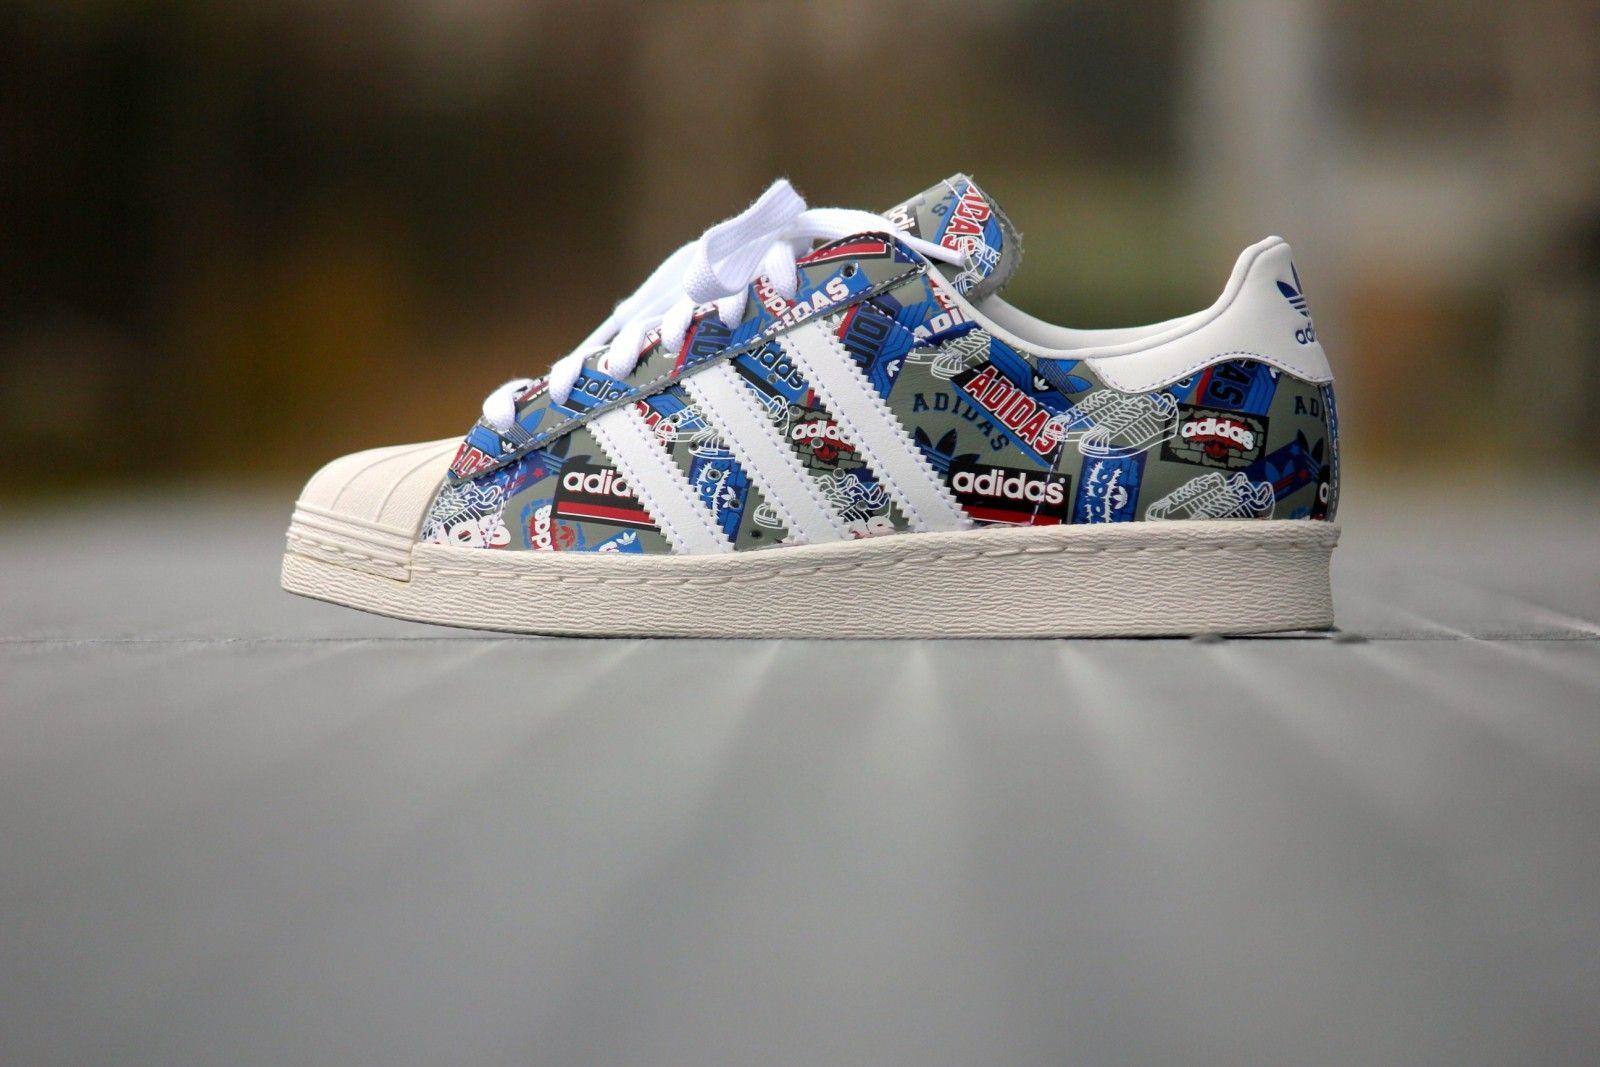 Adidas Superstar 80's B35768 Pioneer Pack by Nigo B35768 80's | Superstars 2b8830